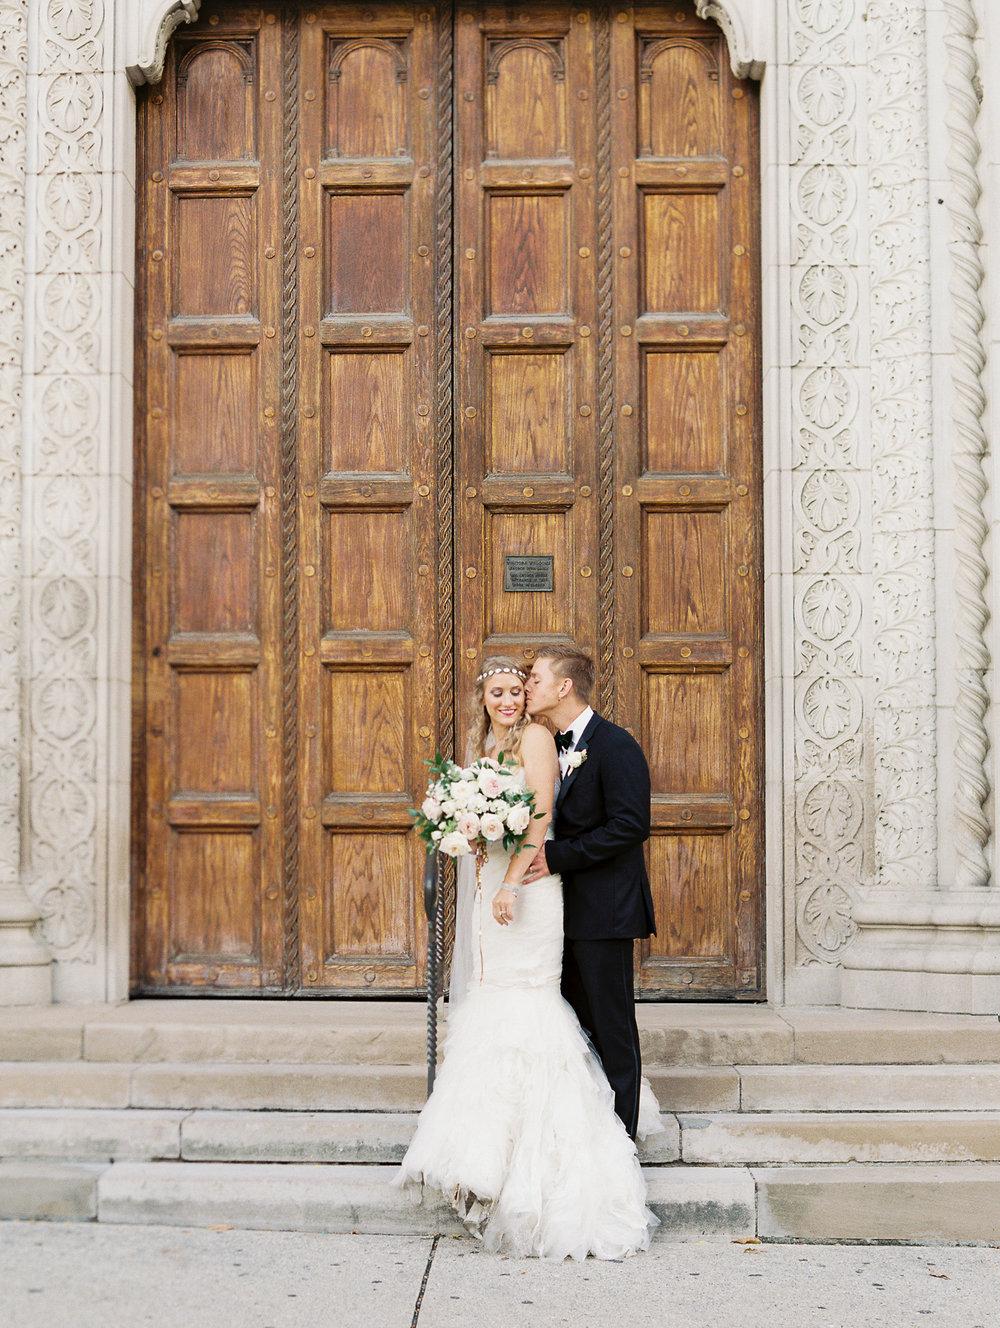 Zawisza Wedding f ASP©-79.jpg